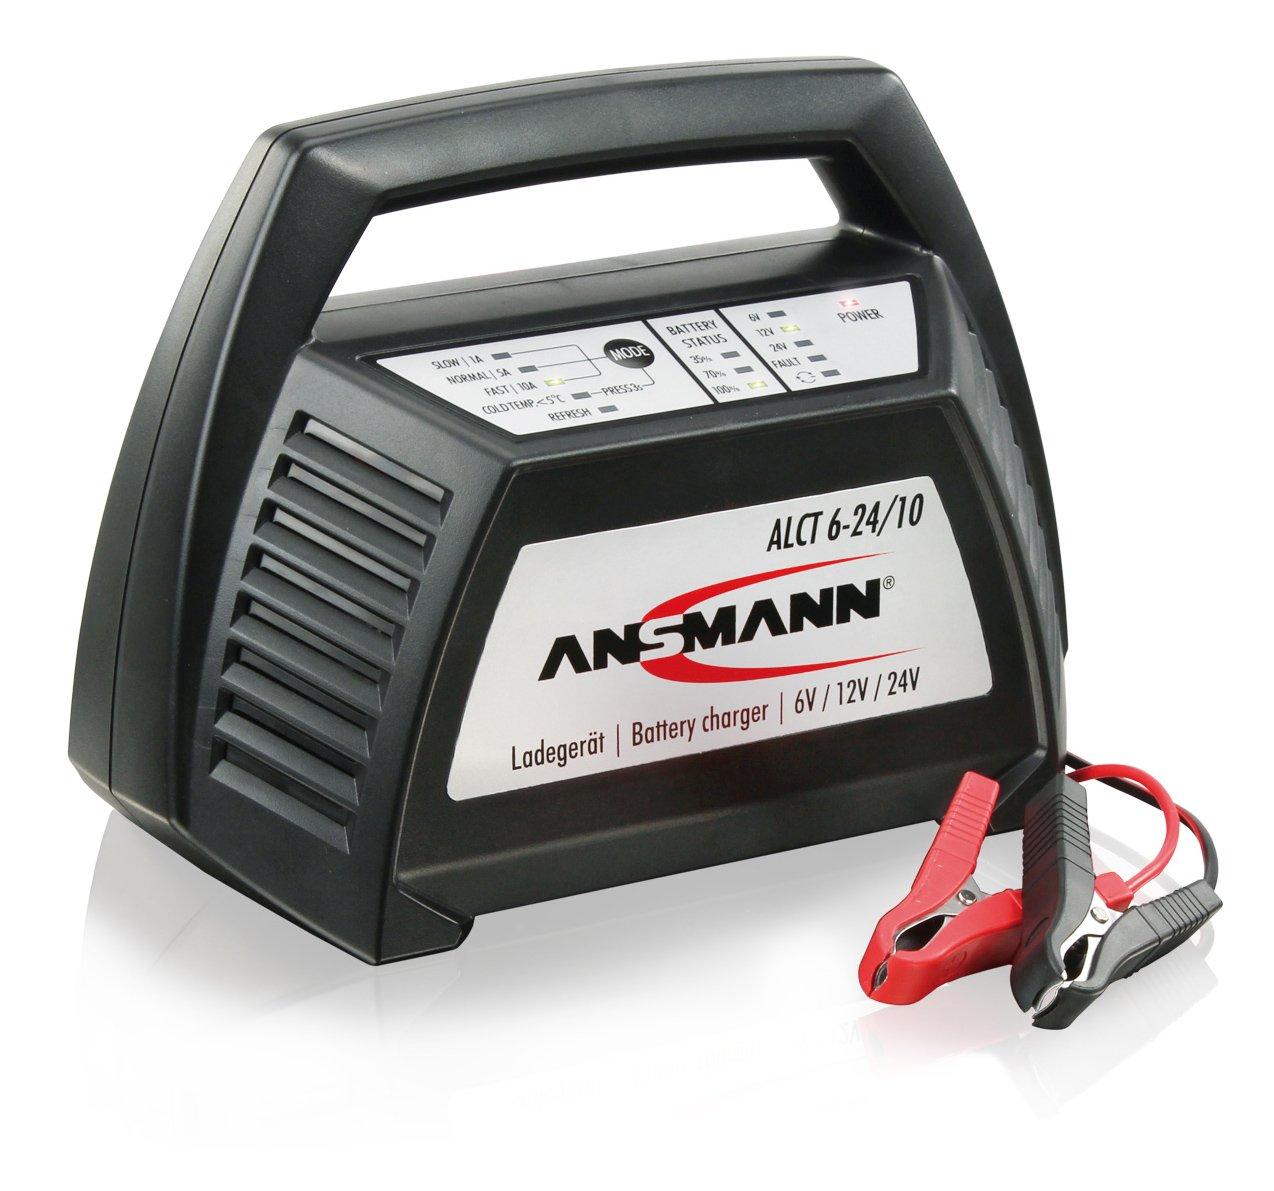 ANSMANN Autobatterie Ladegerä t ALCT 6-24/10 - Vollautomatisches Batterieladegerä t fü r Autobatterien & Bleiakkus mit 6V, 12V & 24V / 10A - Erhaltungsladegerä t ideal fü r PKW, Motorrad, Boot etc. Service Best 1001-0014